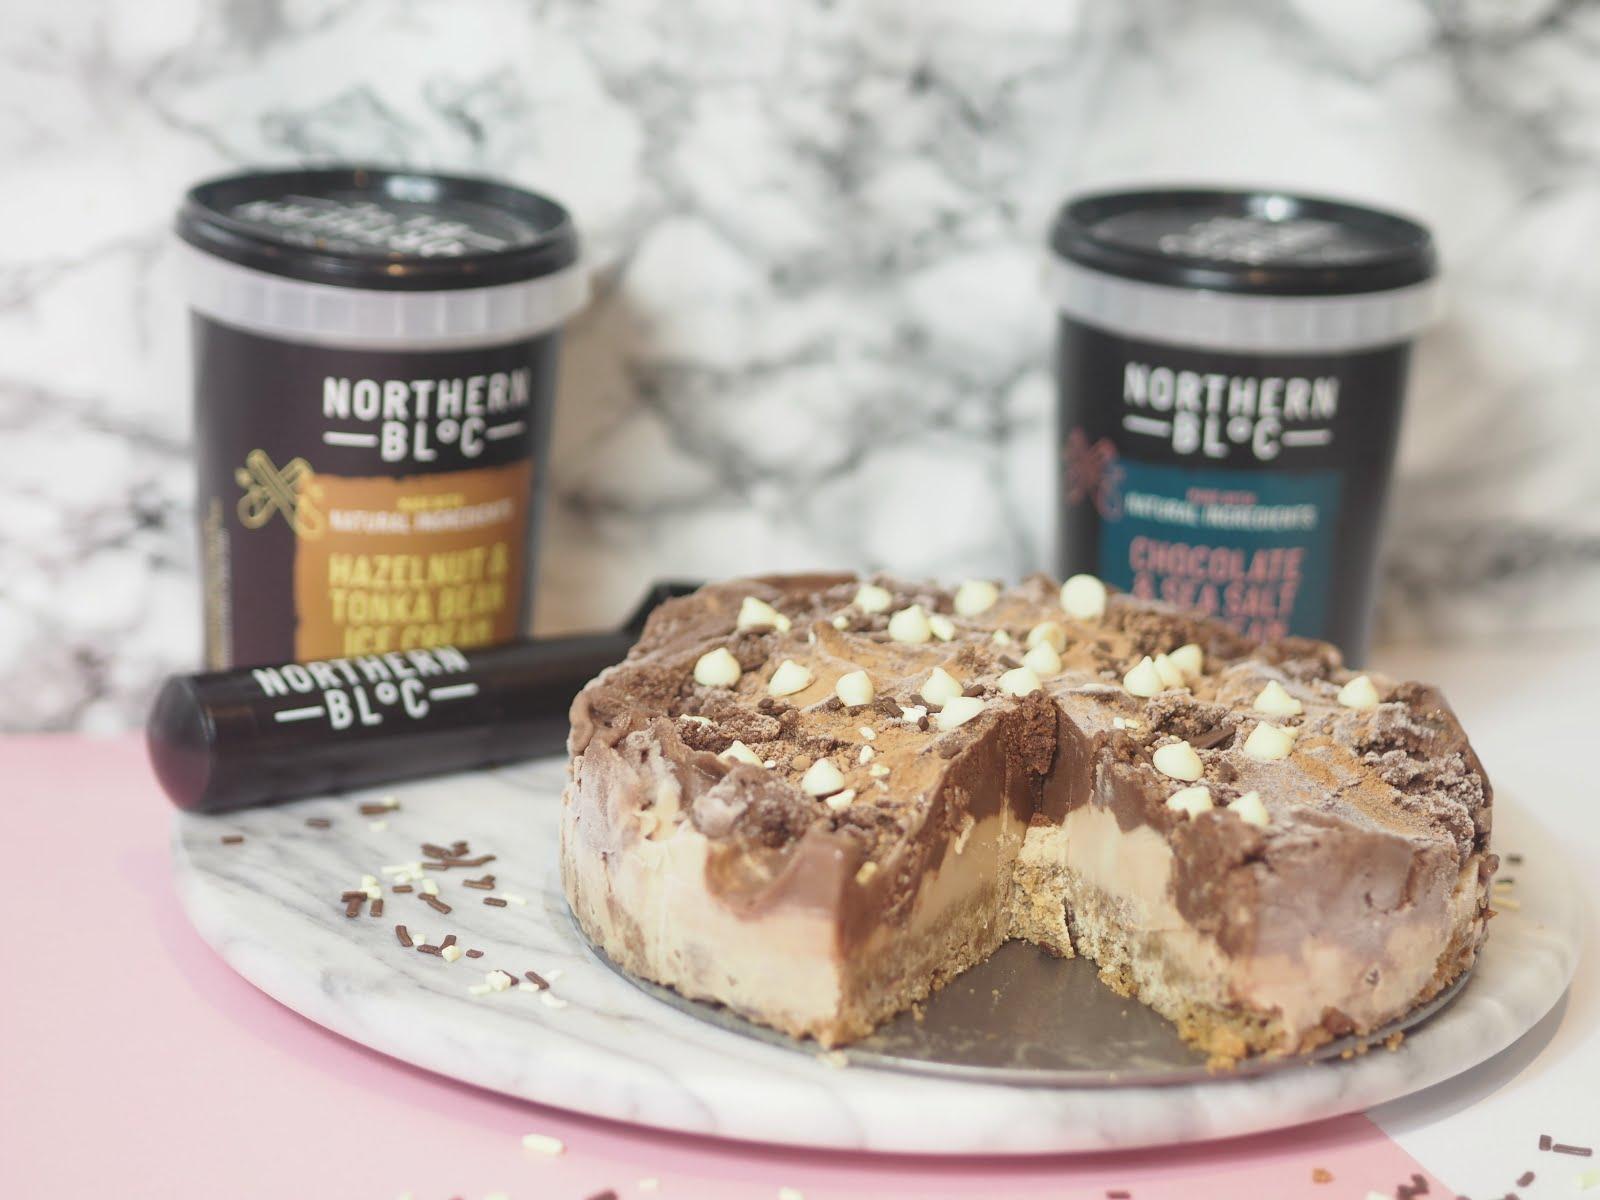 The Ice Cream Cake with Northern Bloc